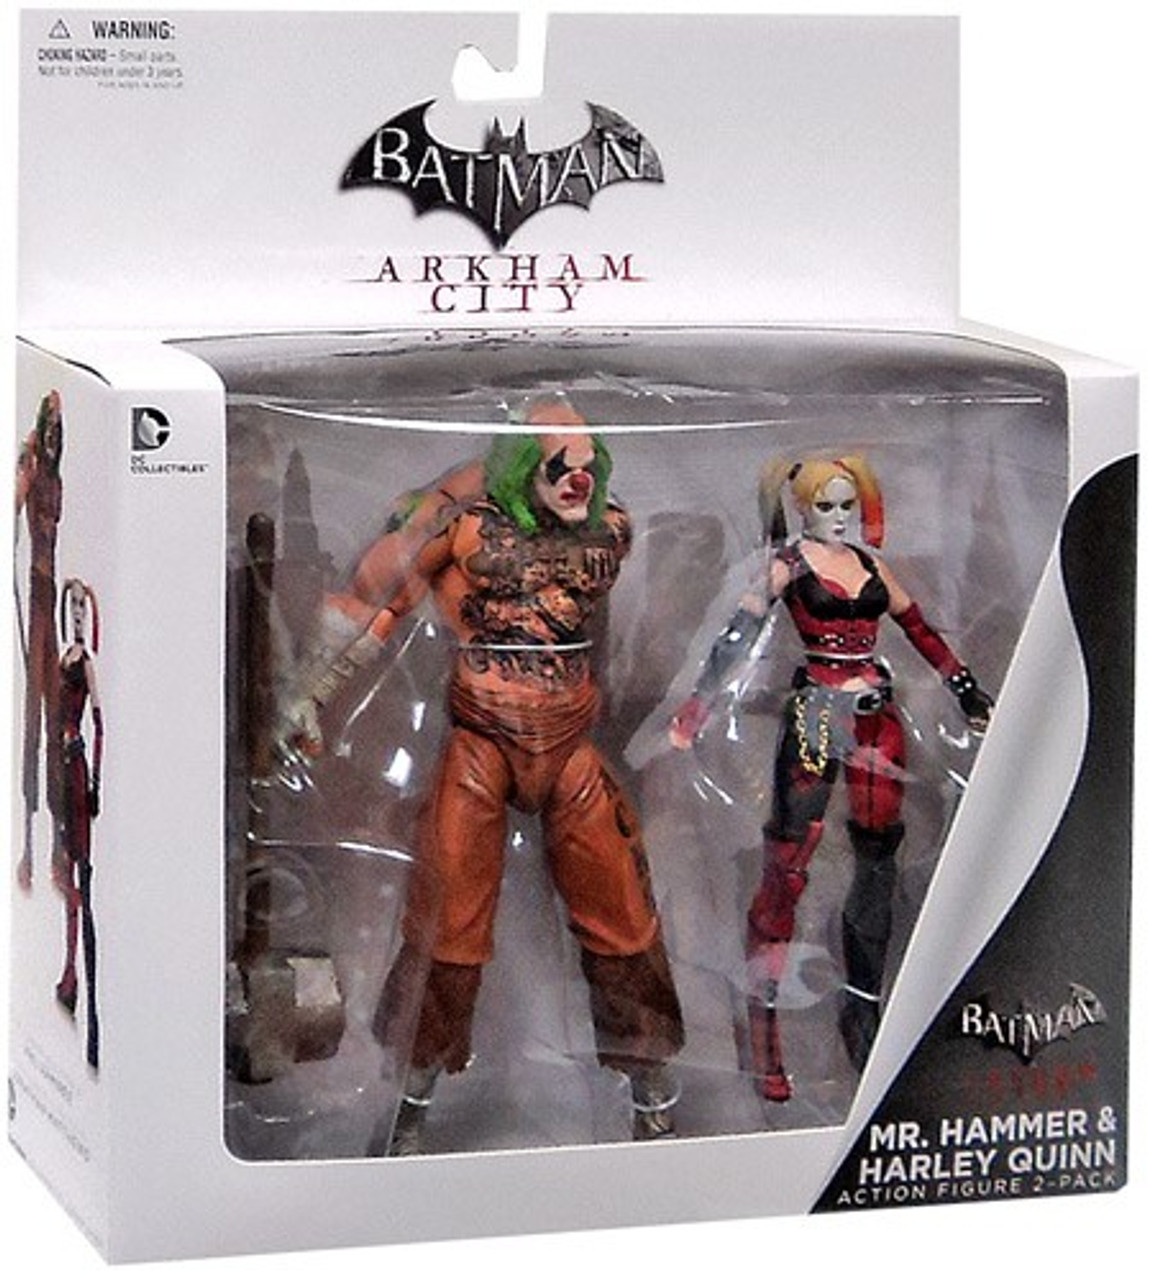 Batman Arkham City Mr. Hammer & Harley Quinn Action Figure 2-Pack